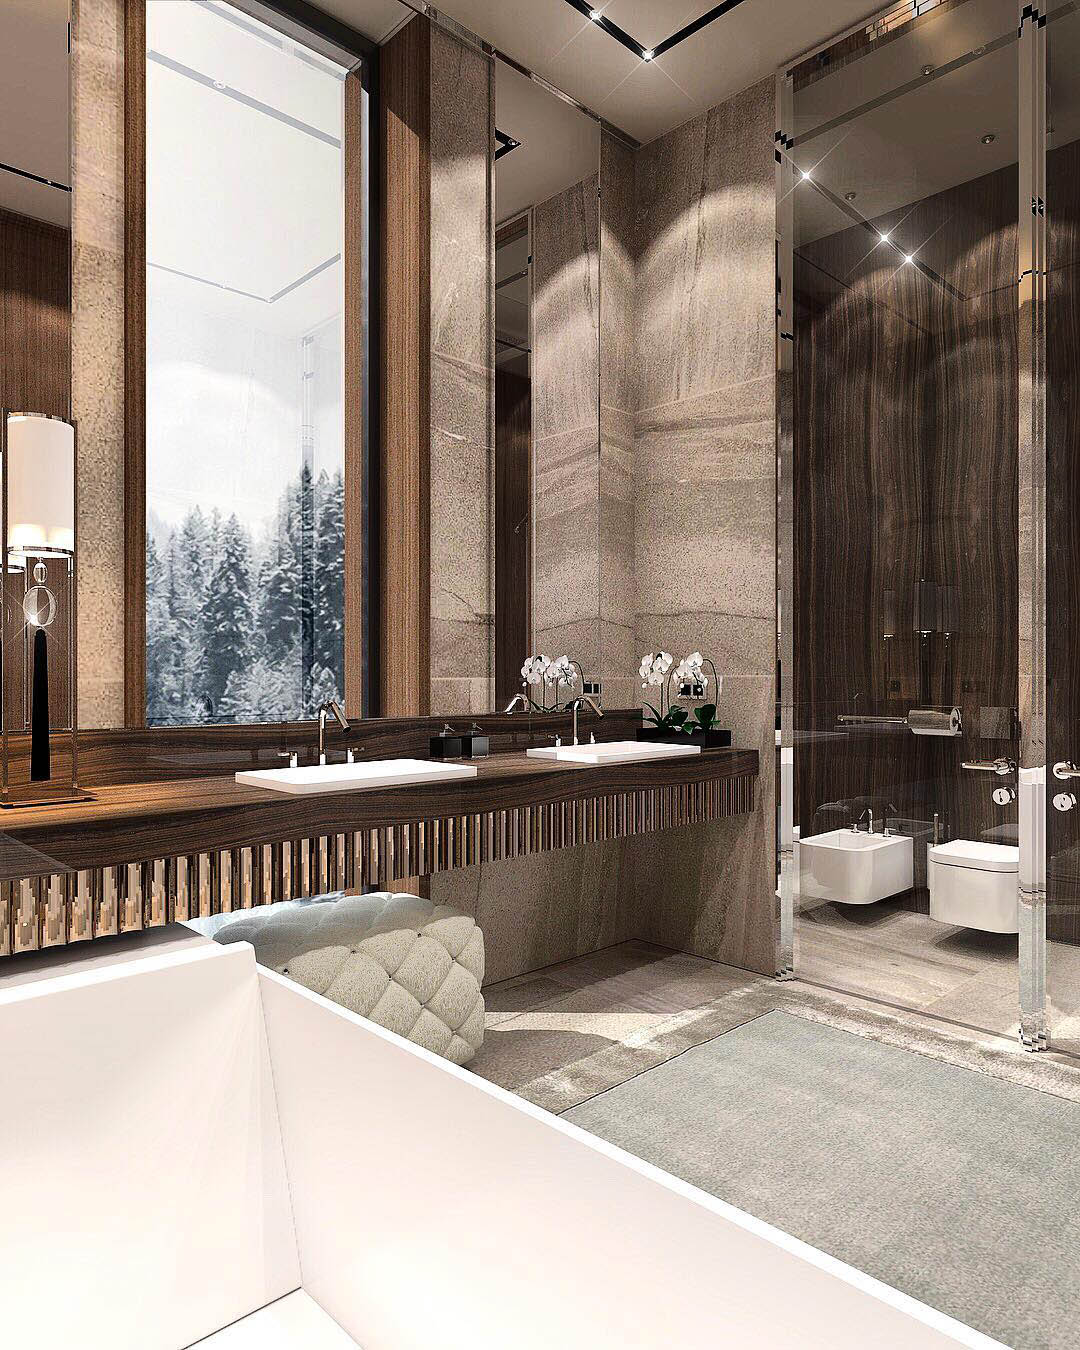 Constantin Frolov Interior Design | Luxurious Bathroom